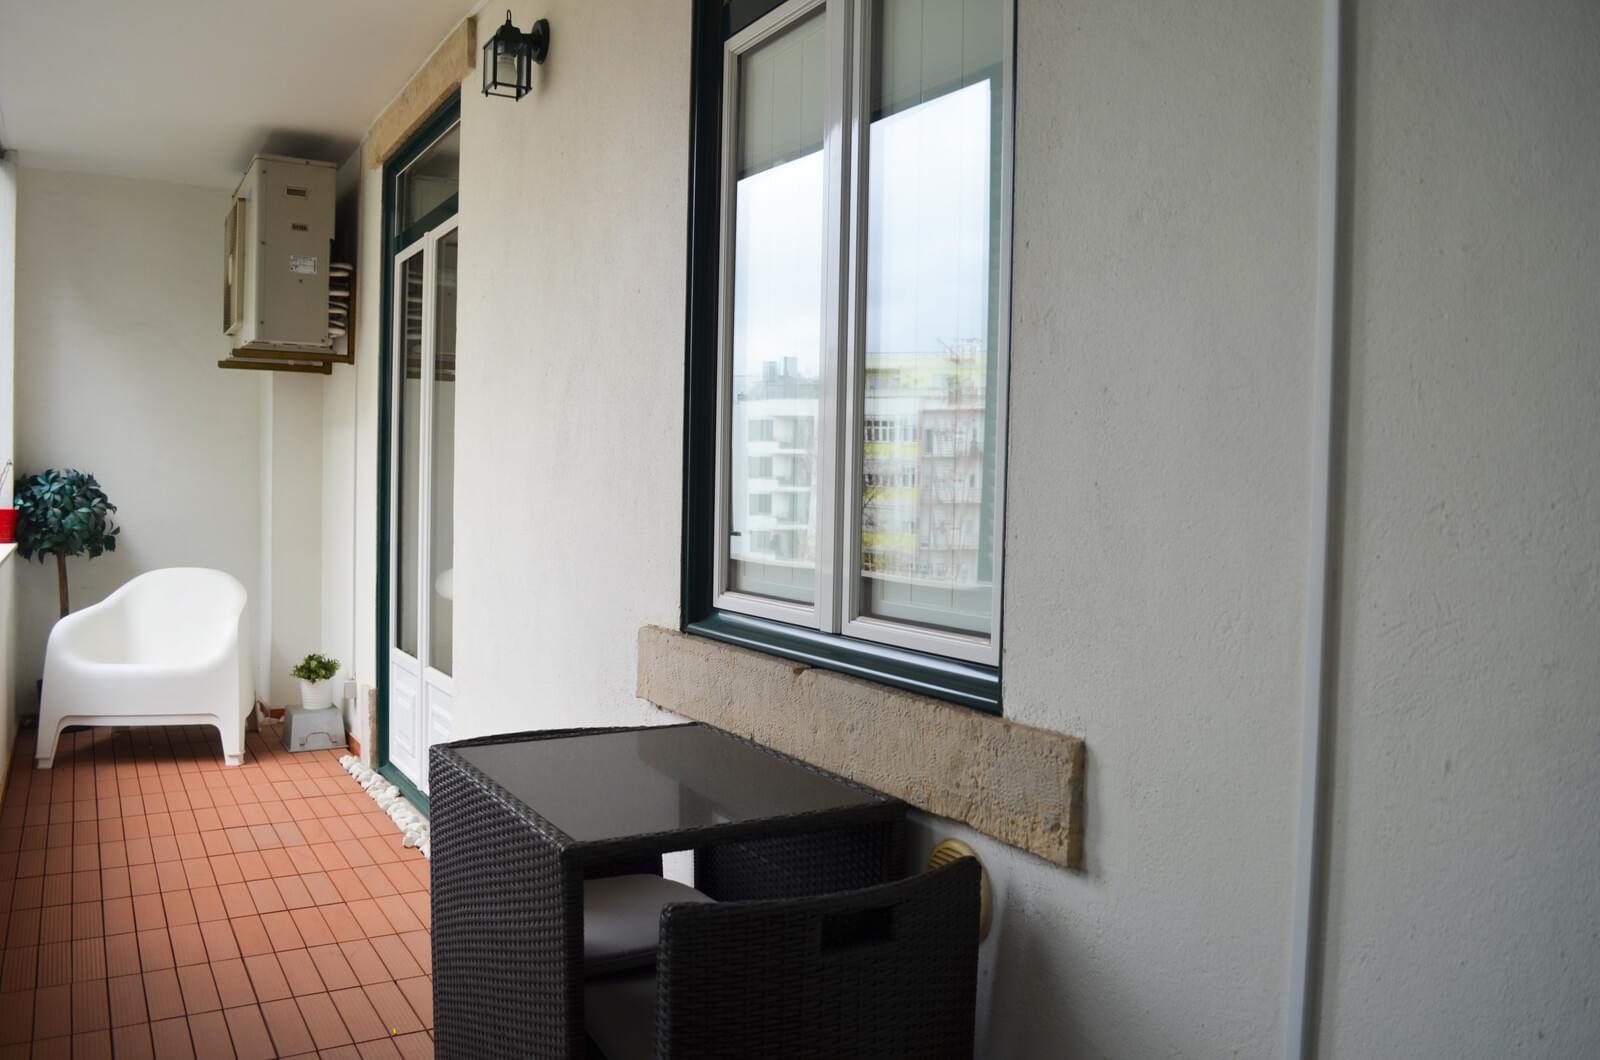 pf18839-apartamento-t2-lisboa-9e0837f8-daee-4d0e-bc08-a4244313b1df